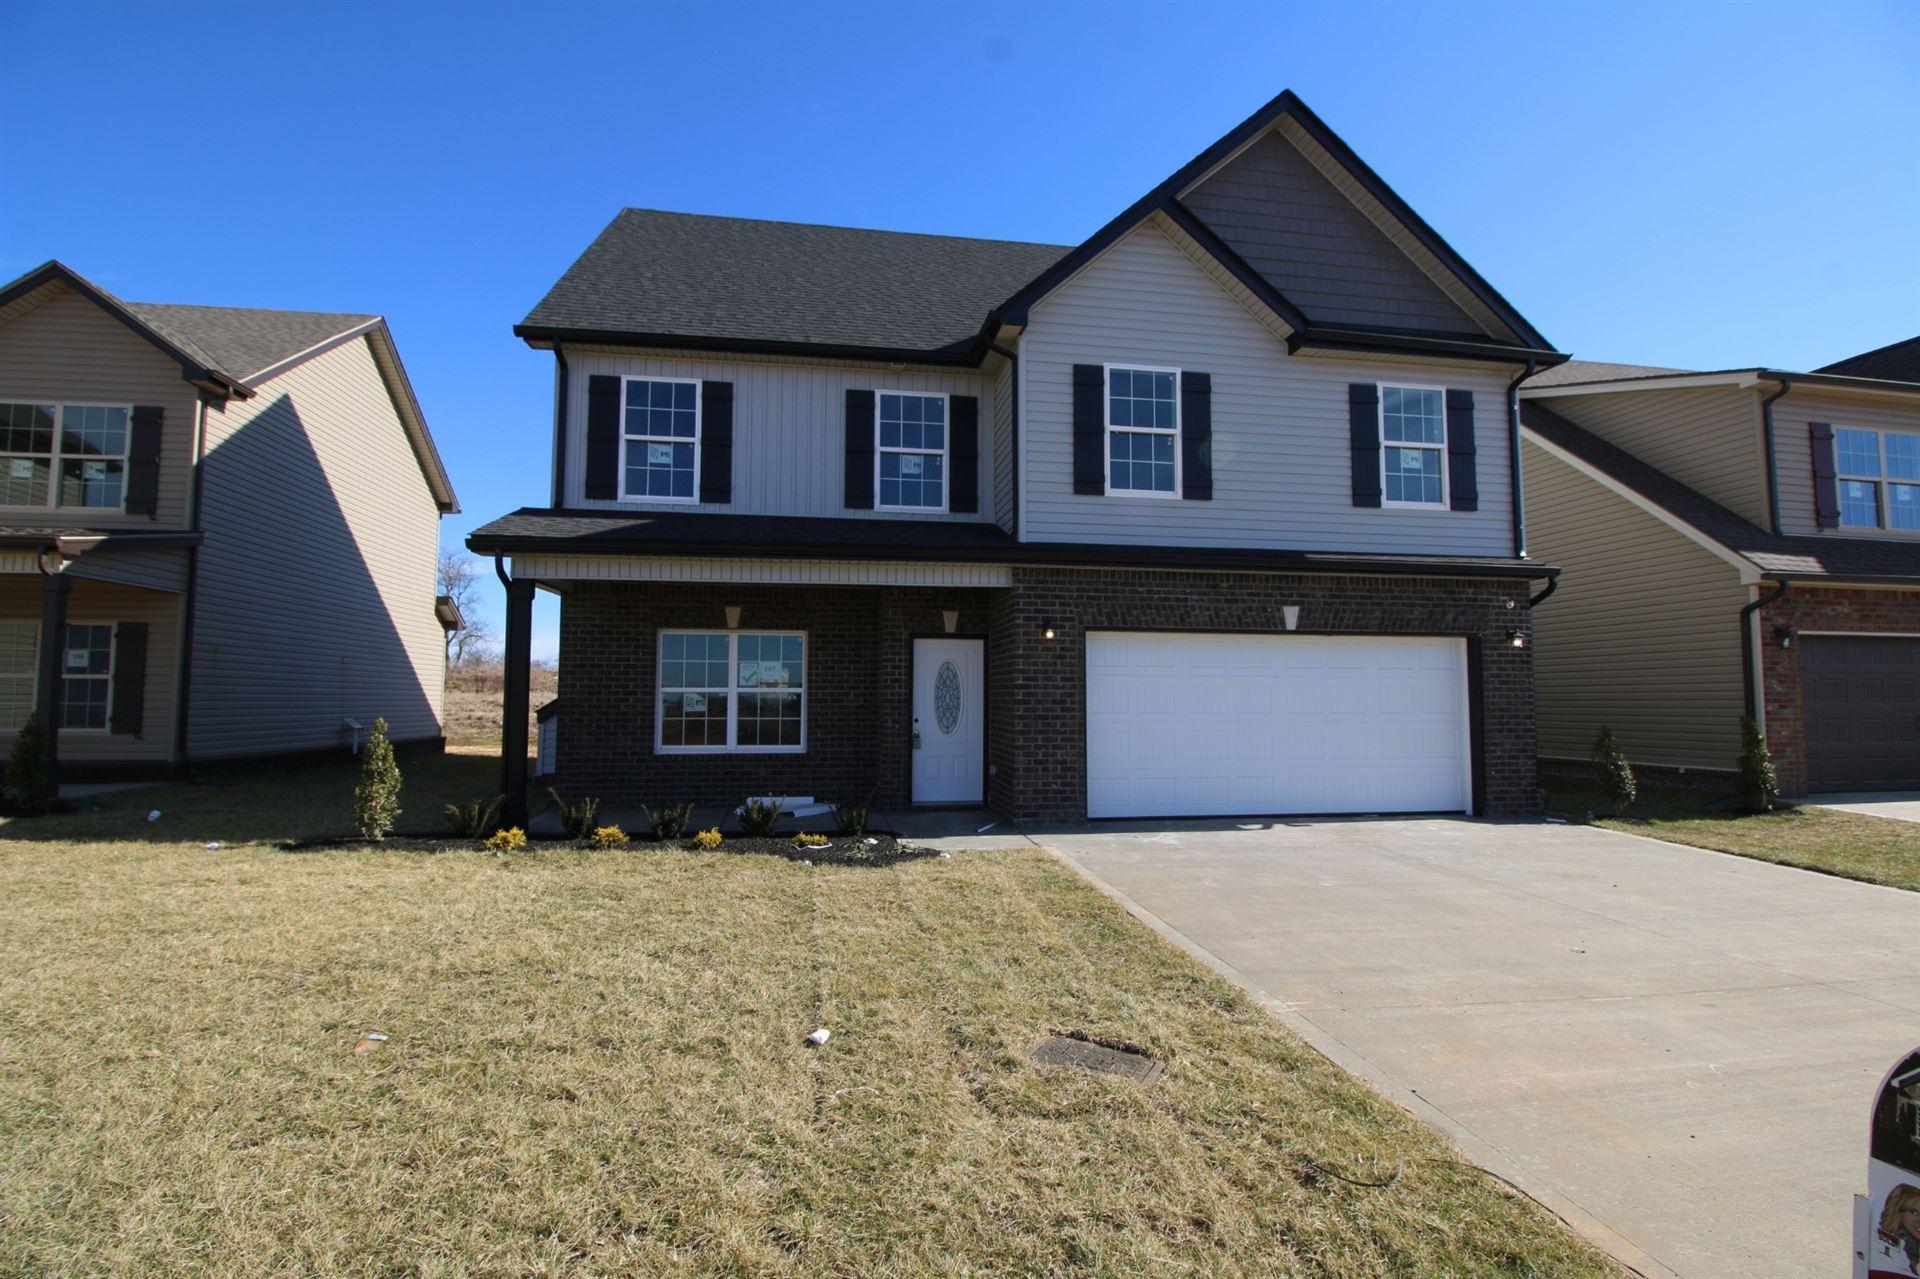 167 Mills Creek, Clarksville, TN 37042 - MLS#: 2298439